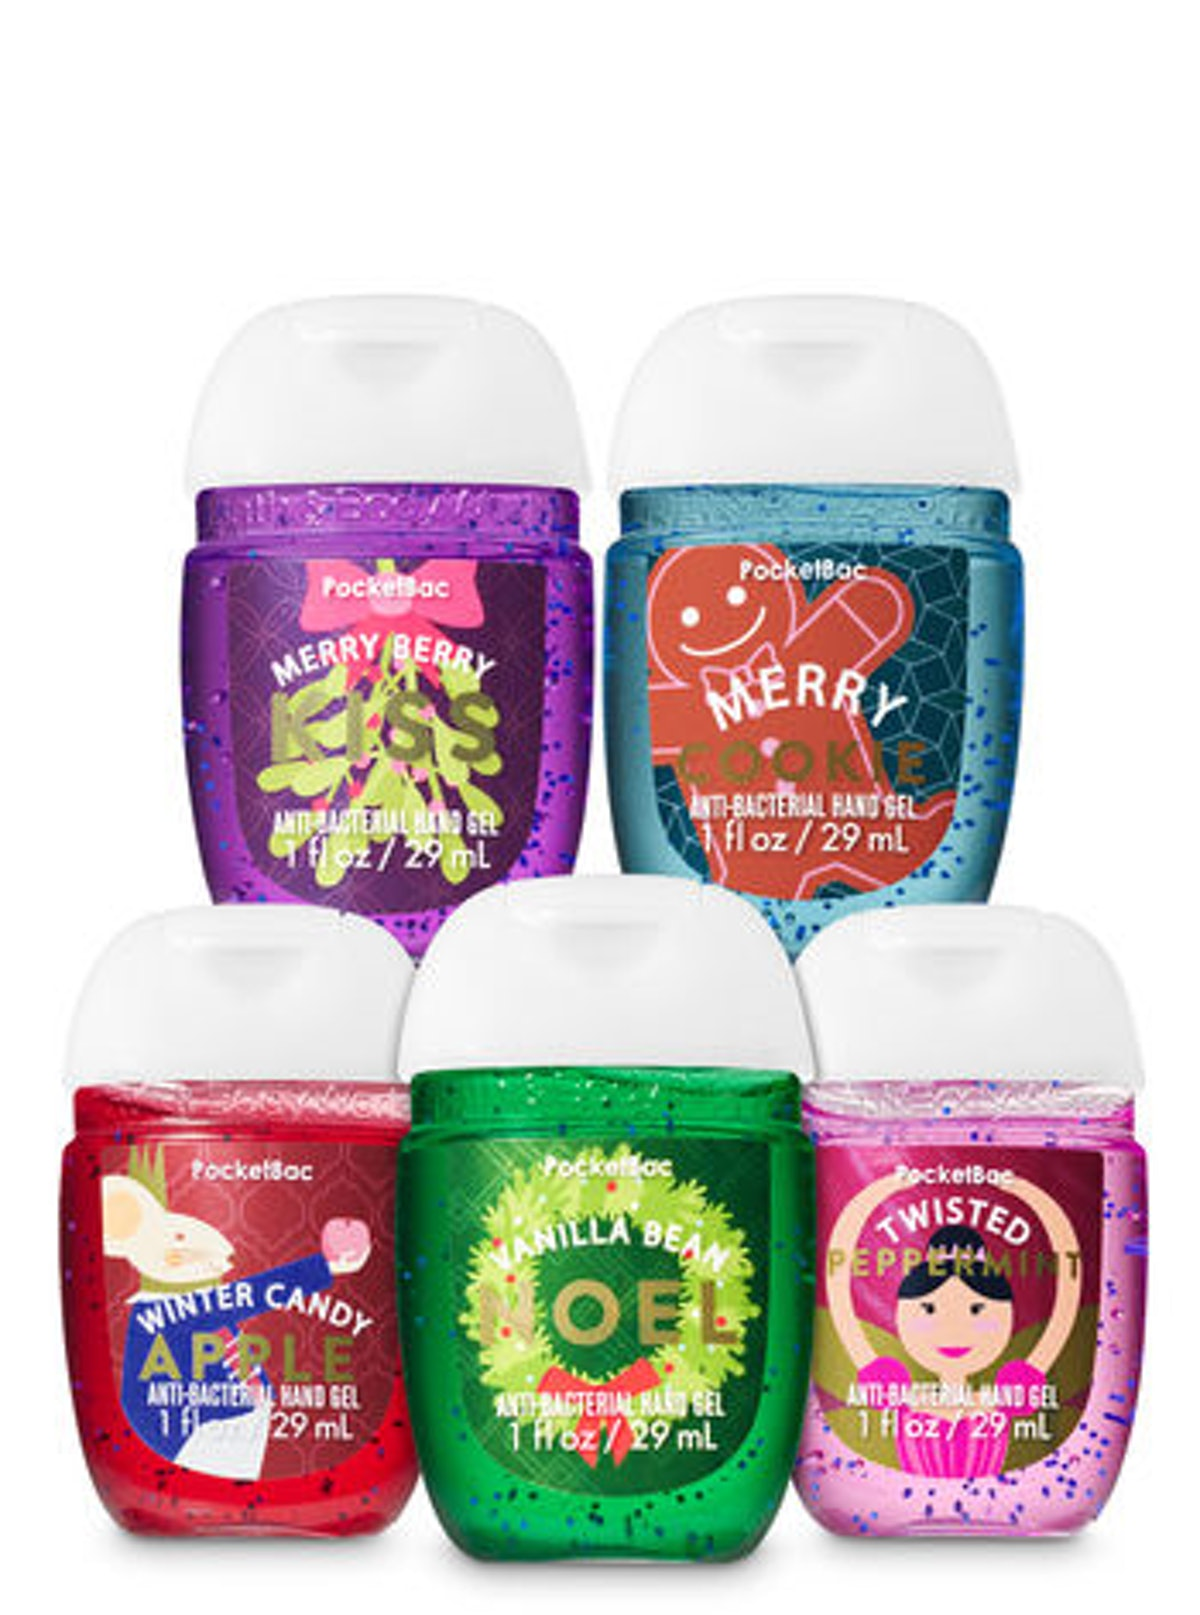 Holiday Favorites PocketBac Hand Sanitizer 5-Pack